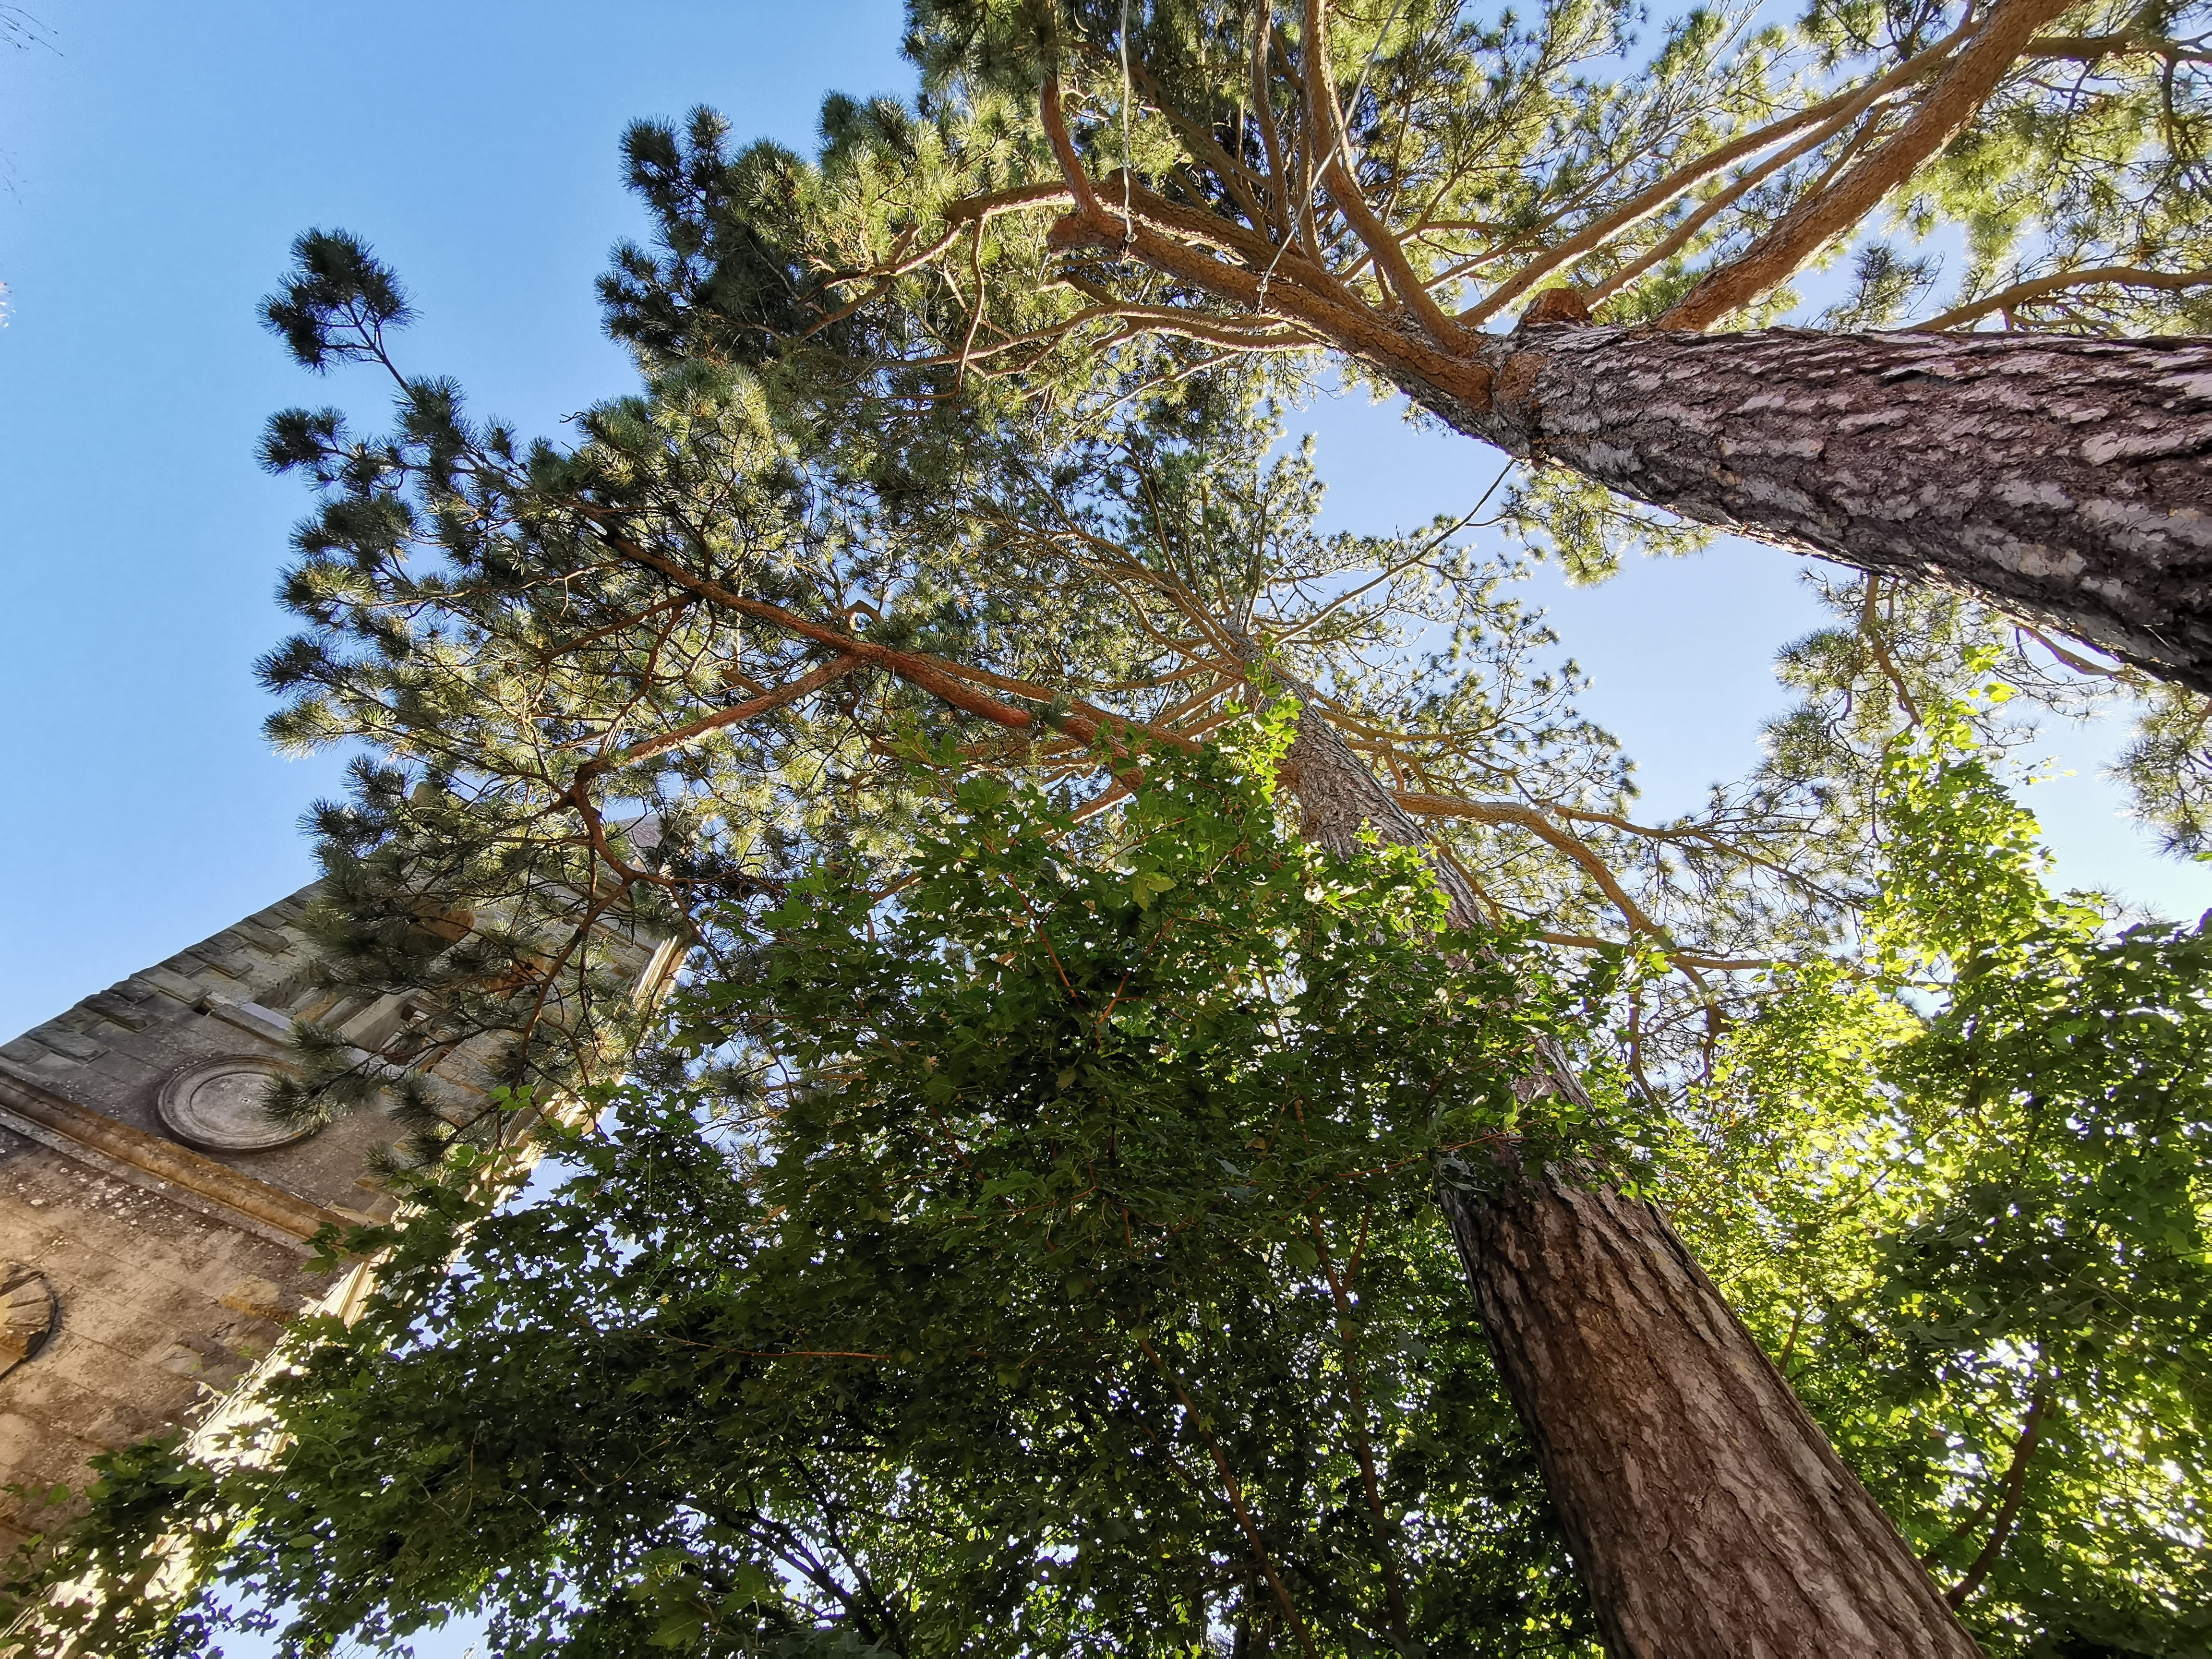 Campanile di Campanara e pini secolari